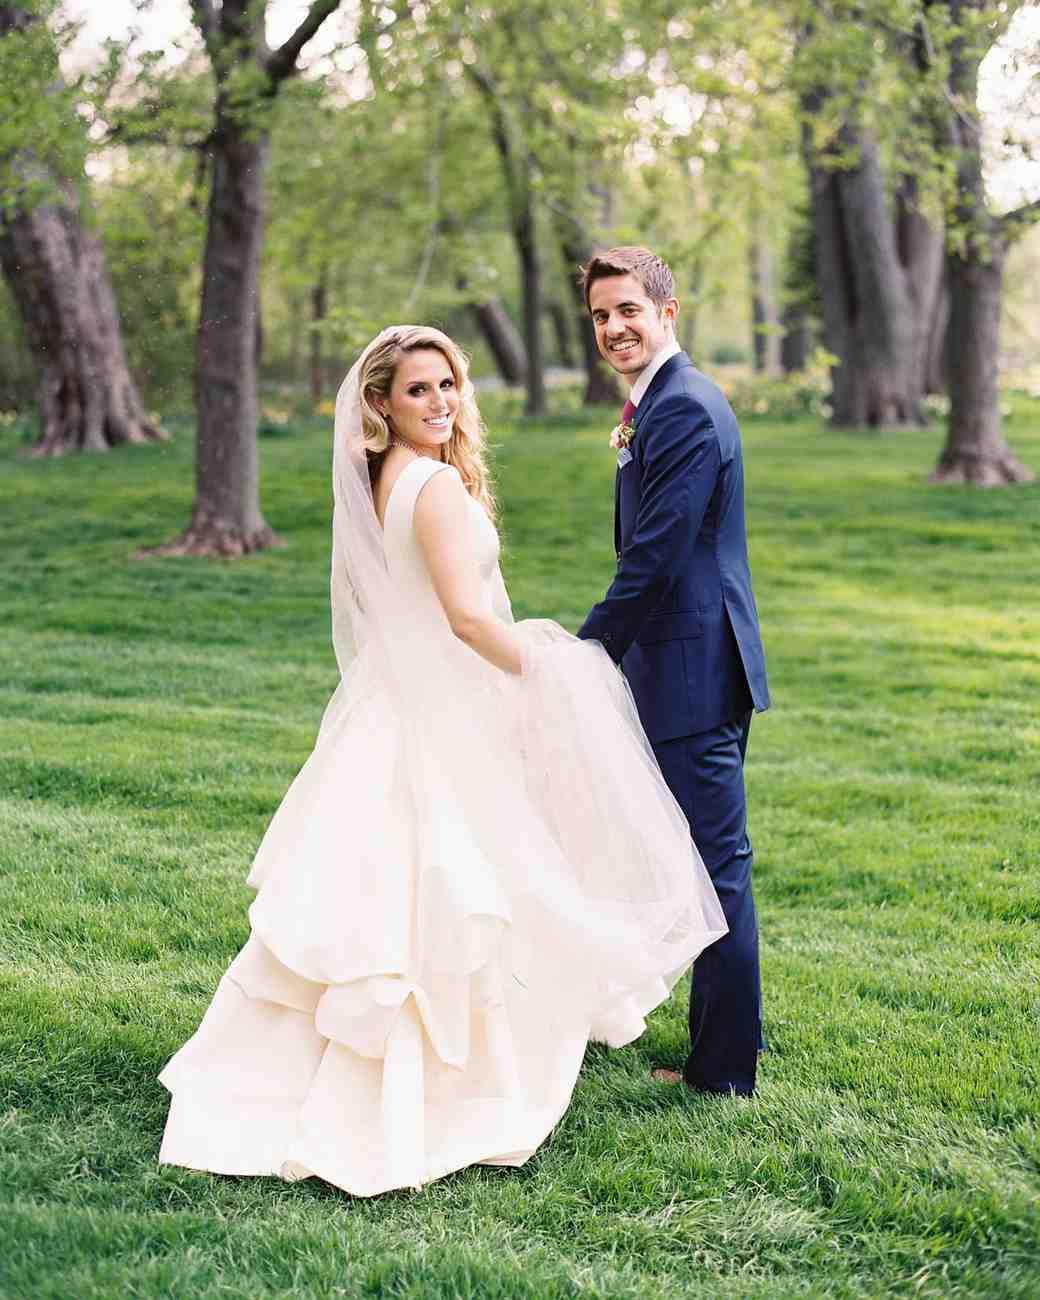 nikki-kiff-wedding-couple-004774015-s112766-0316.jpg